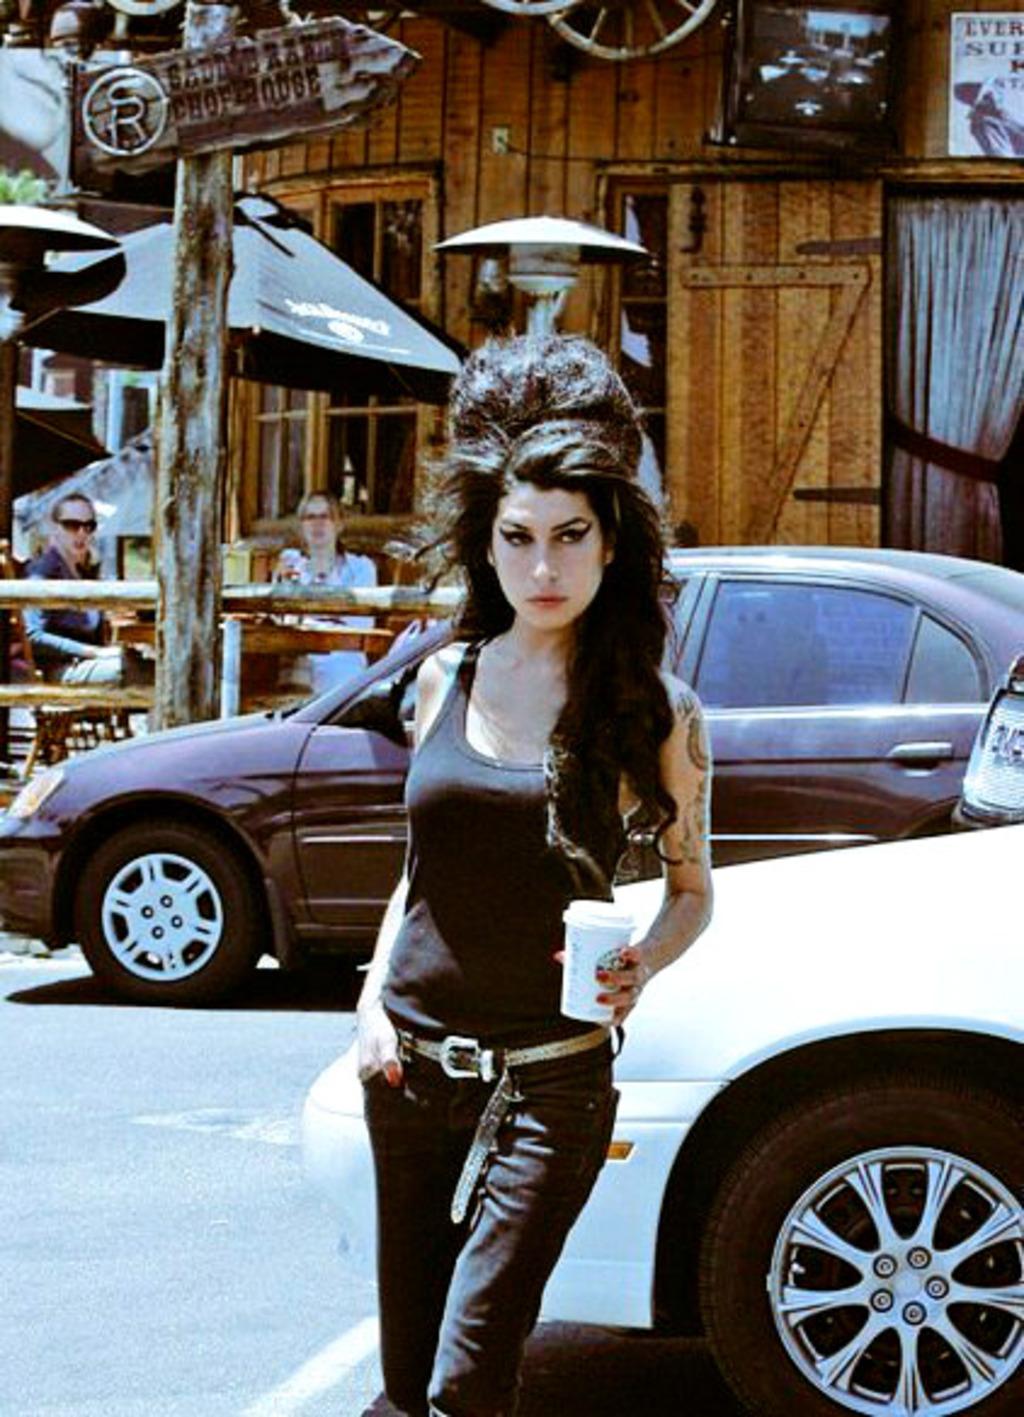 A diez años de la muerte de Amy Winehouse